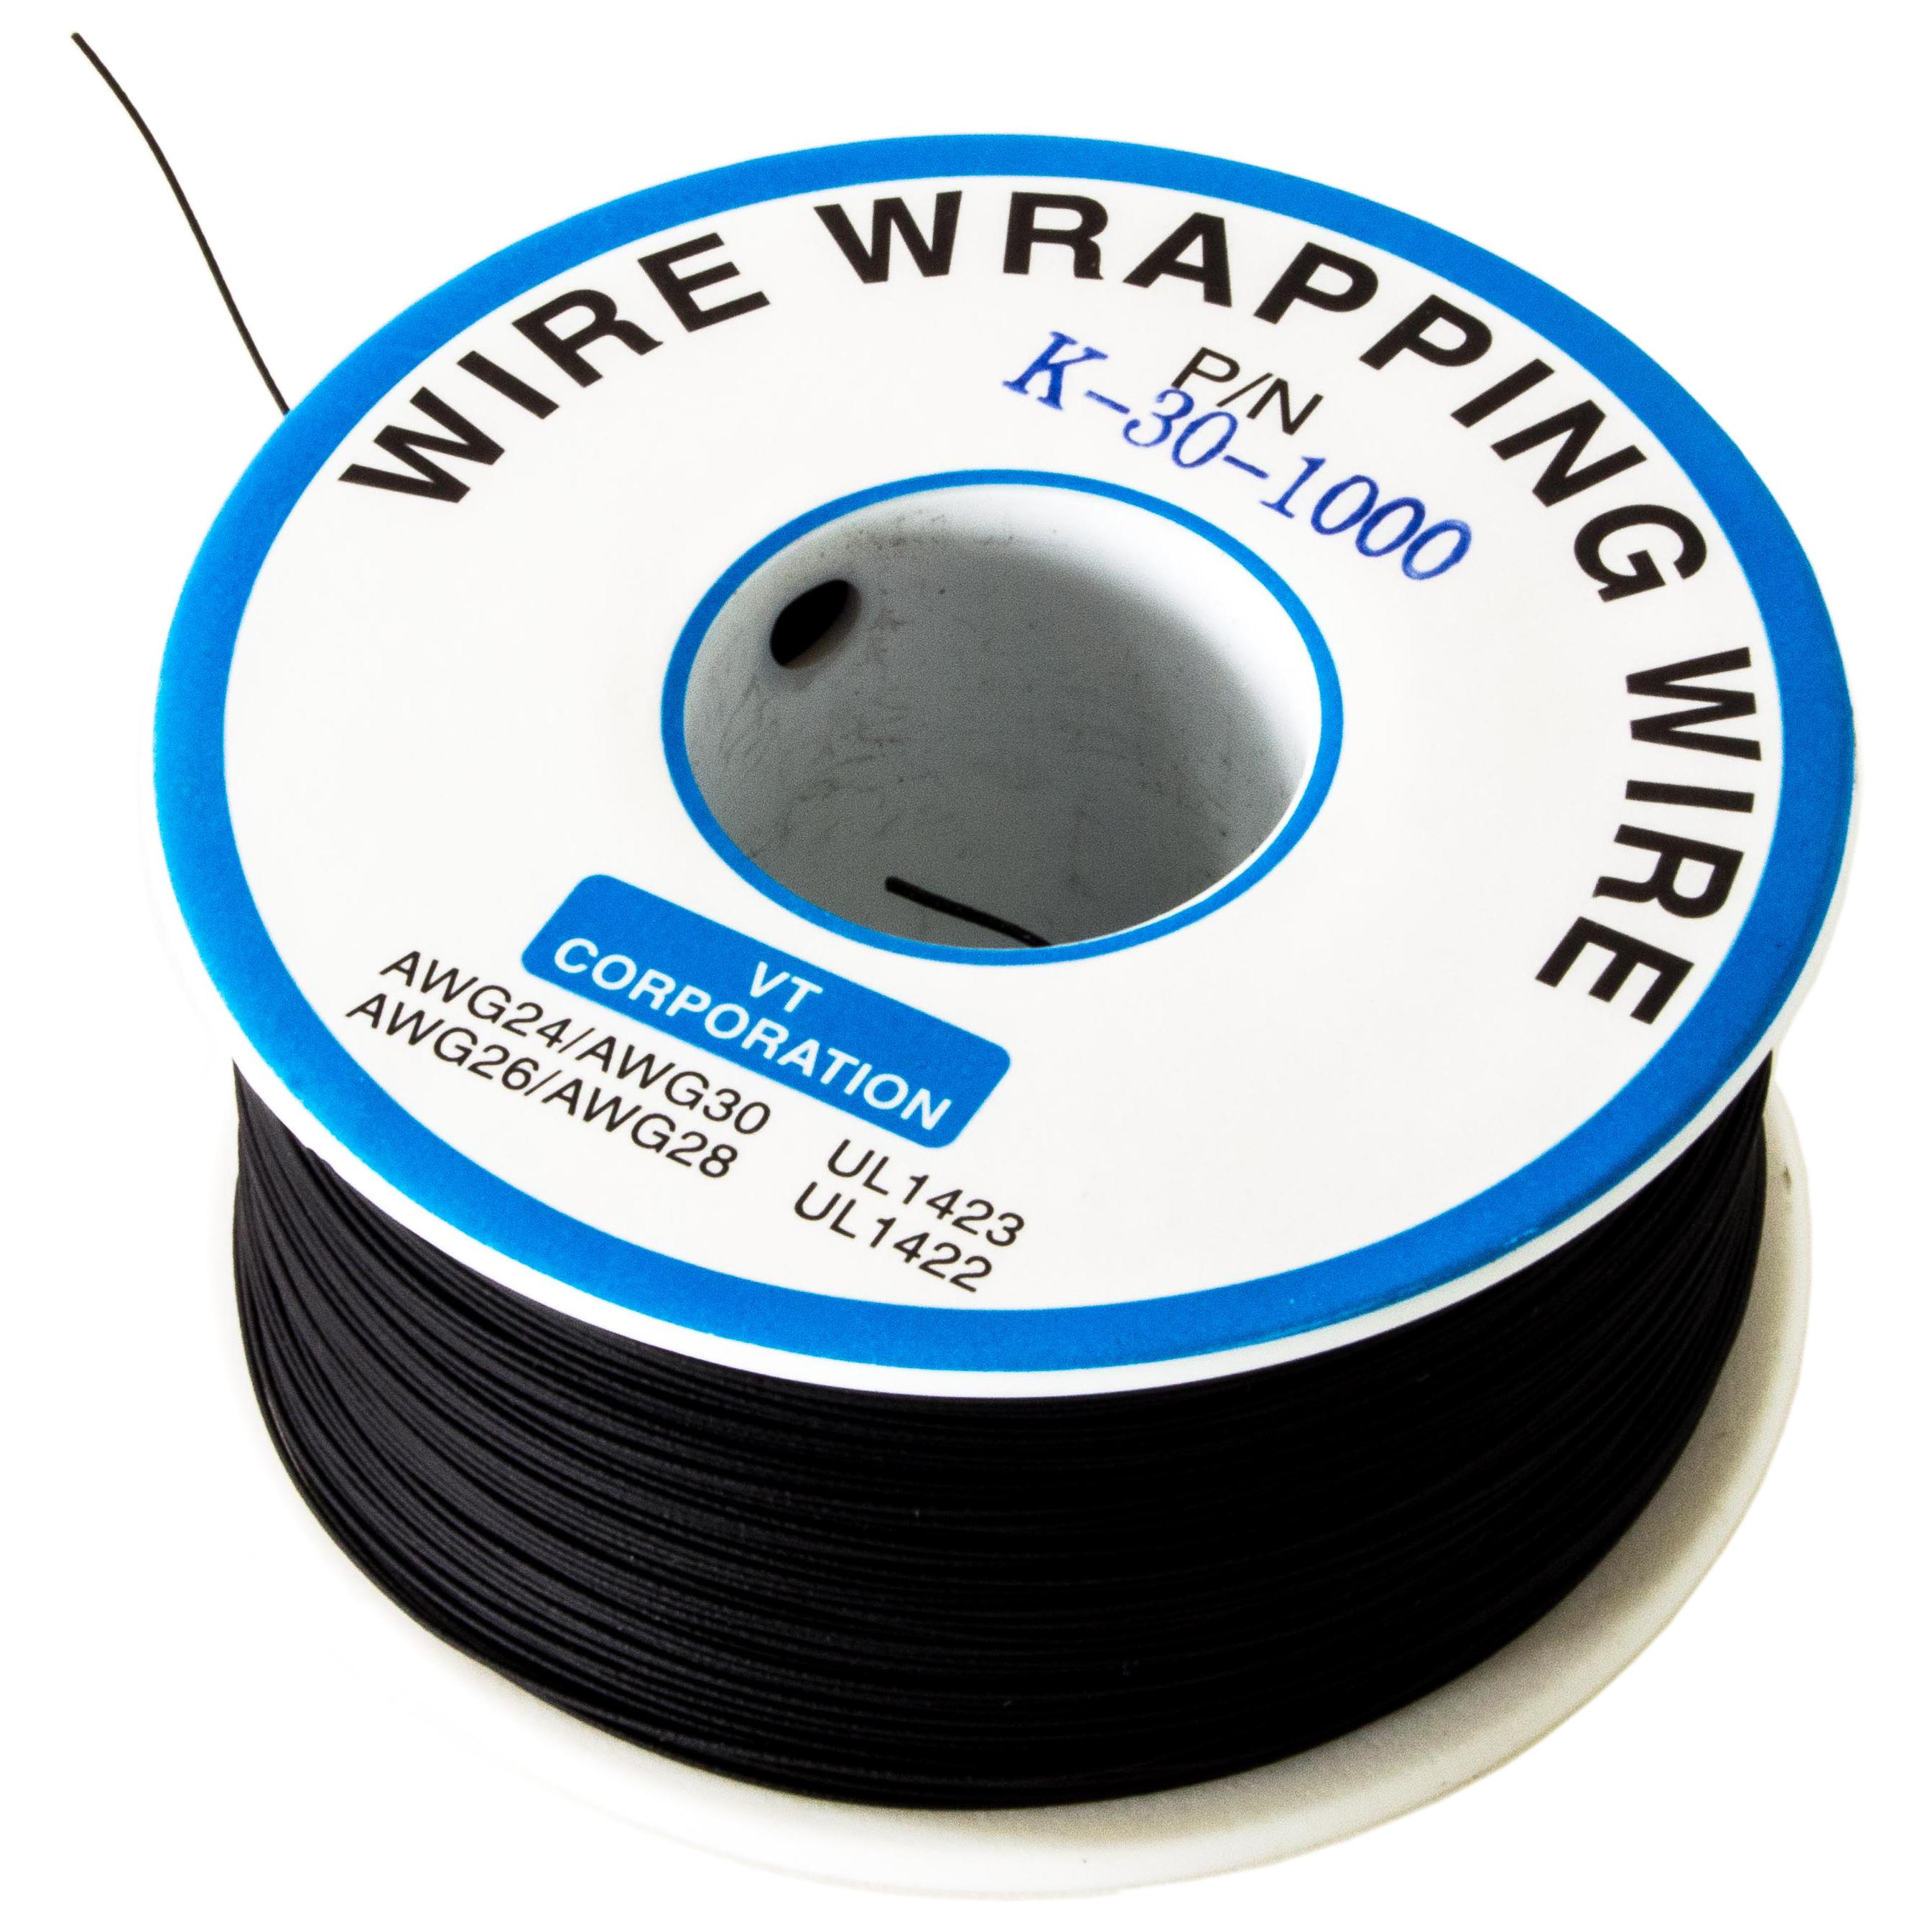 30 gauge Kynar 100 FEET Any Color! 30 AWG KYNAR wire wrap